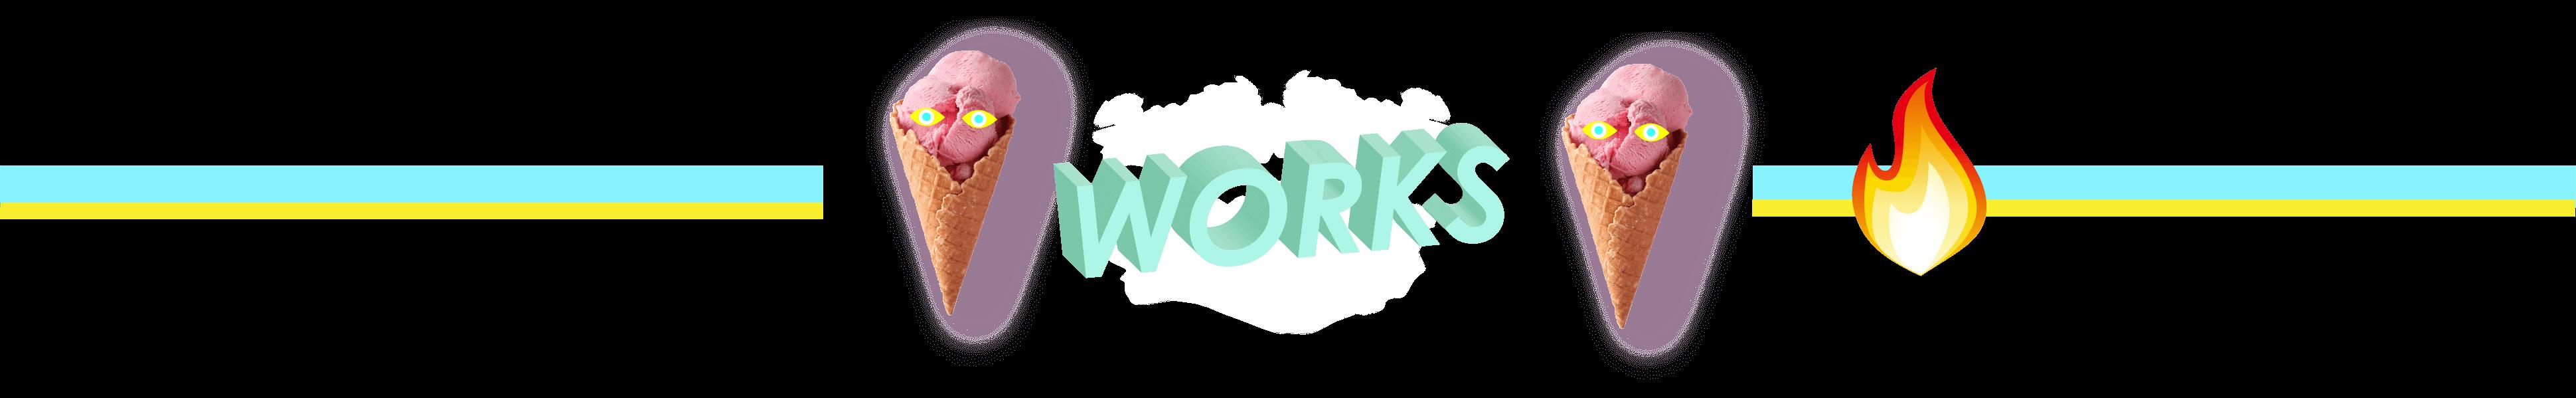 works_class